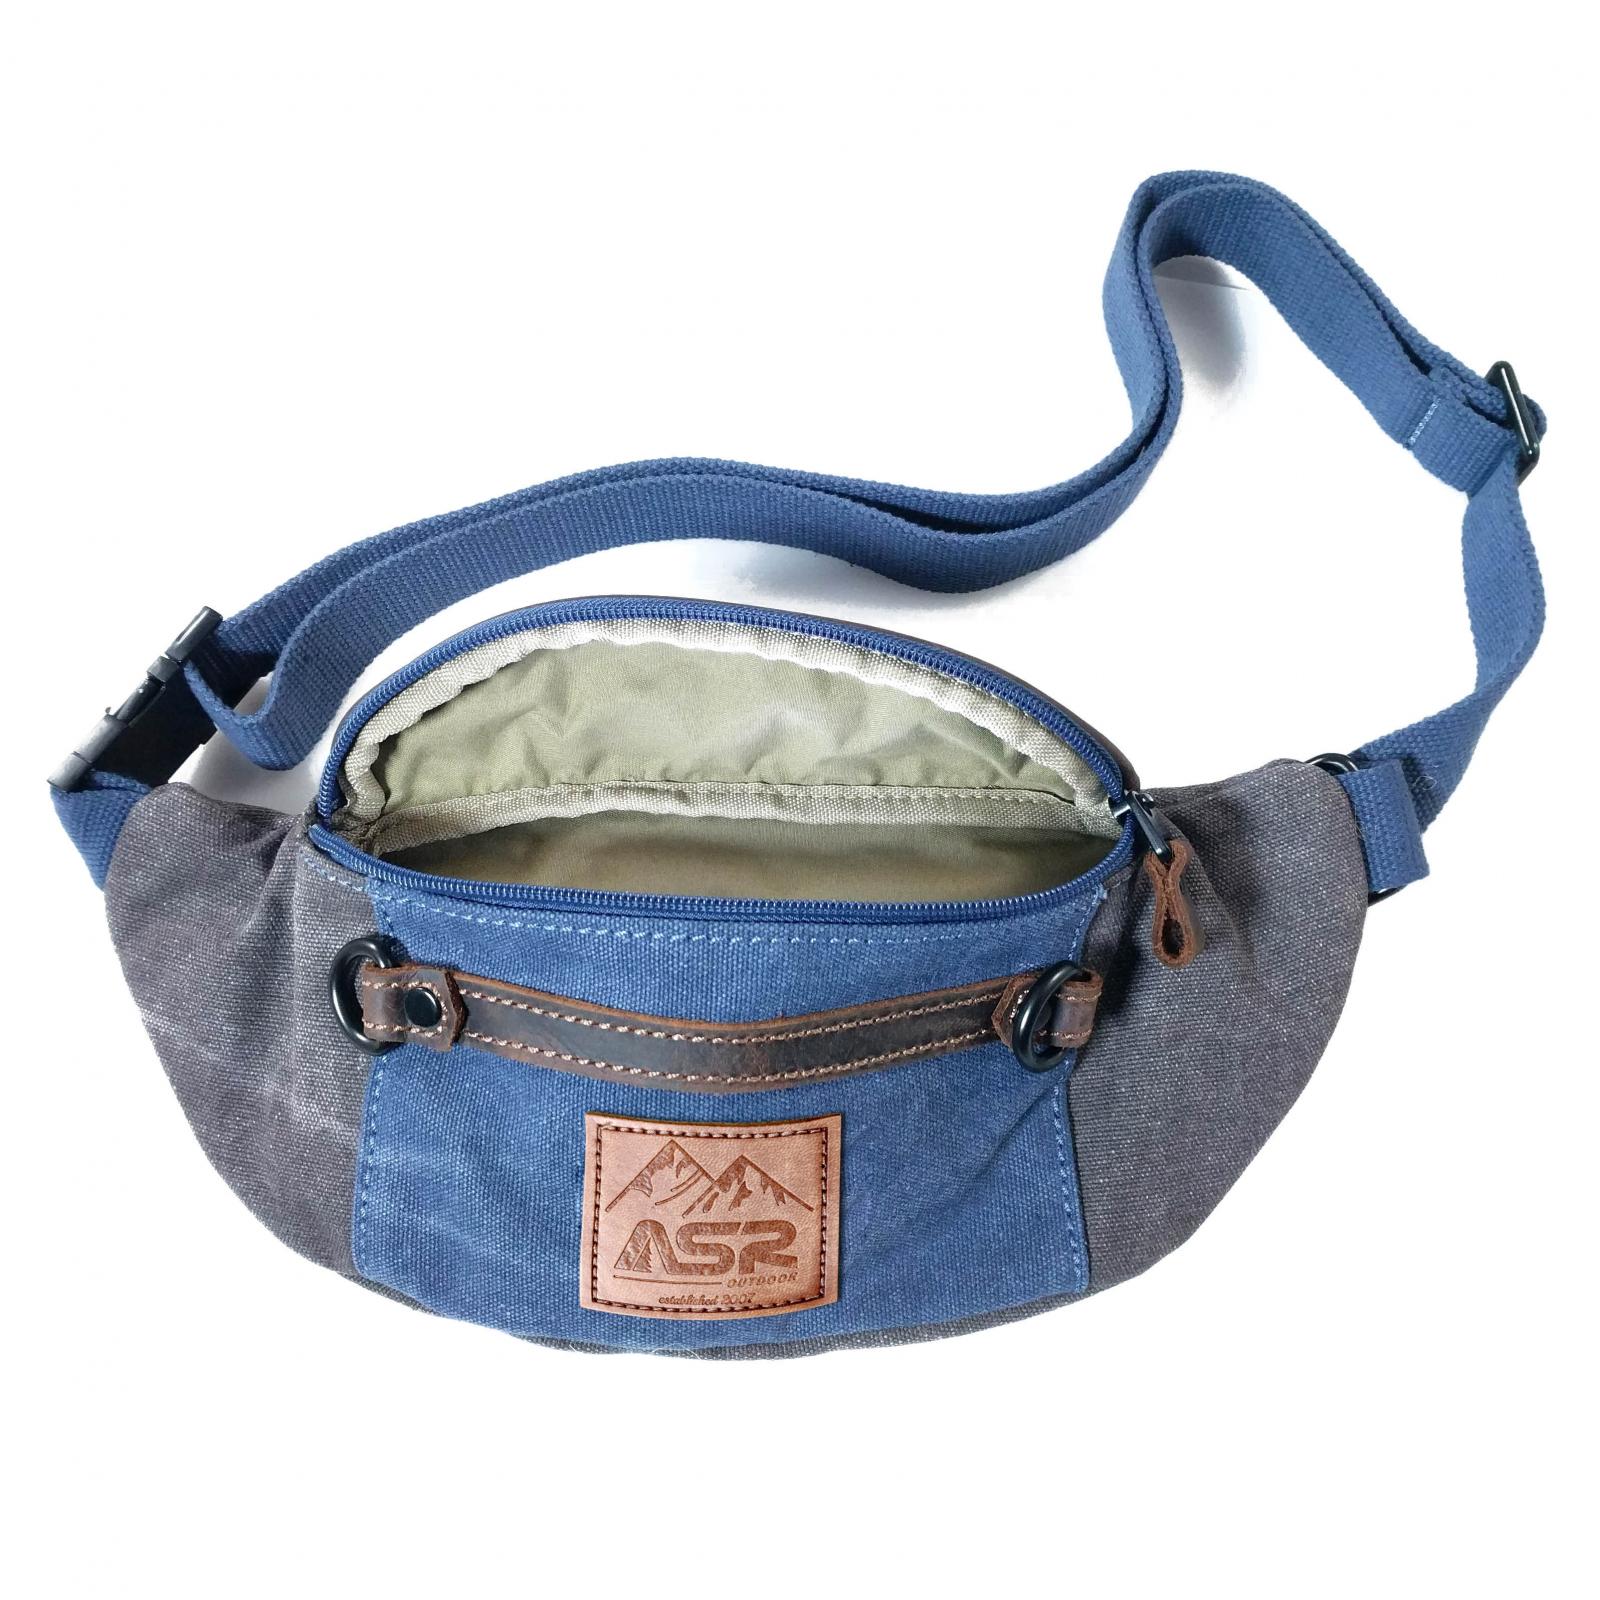 ASR Outdoor Man Pack Fanny Waist Bag Water Resistant - Blue